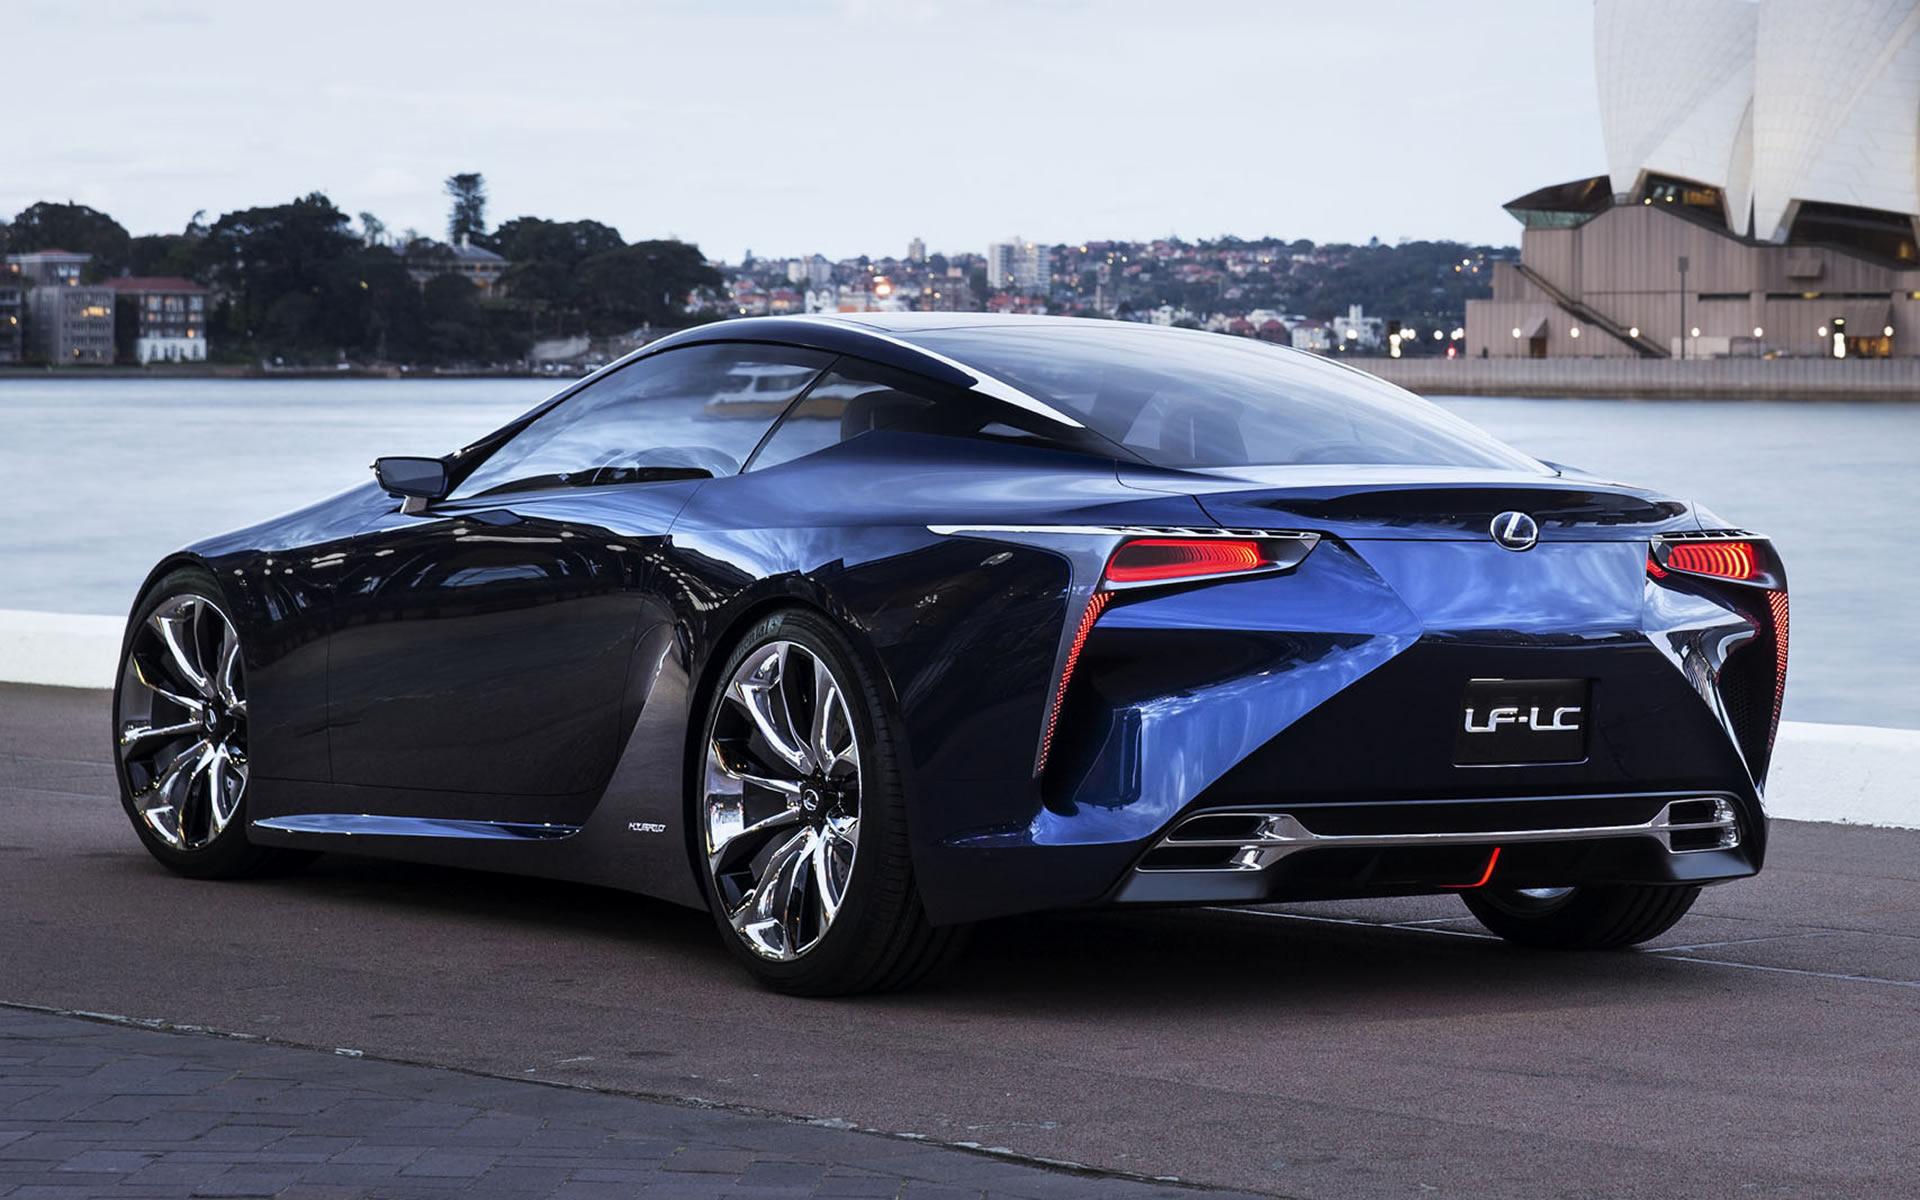 https://www.carpixel.net/w/08caf8b76bd746ef5a6a5402e074f546/lexus-lf-lc-blue-concept-car-wallpaper-68614.jpg